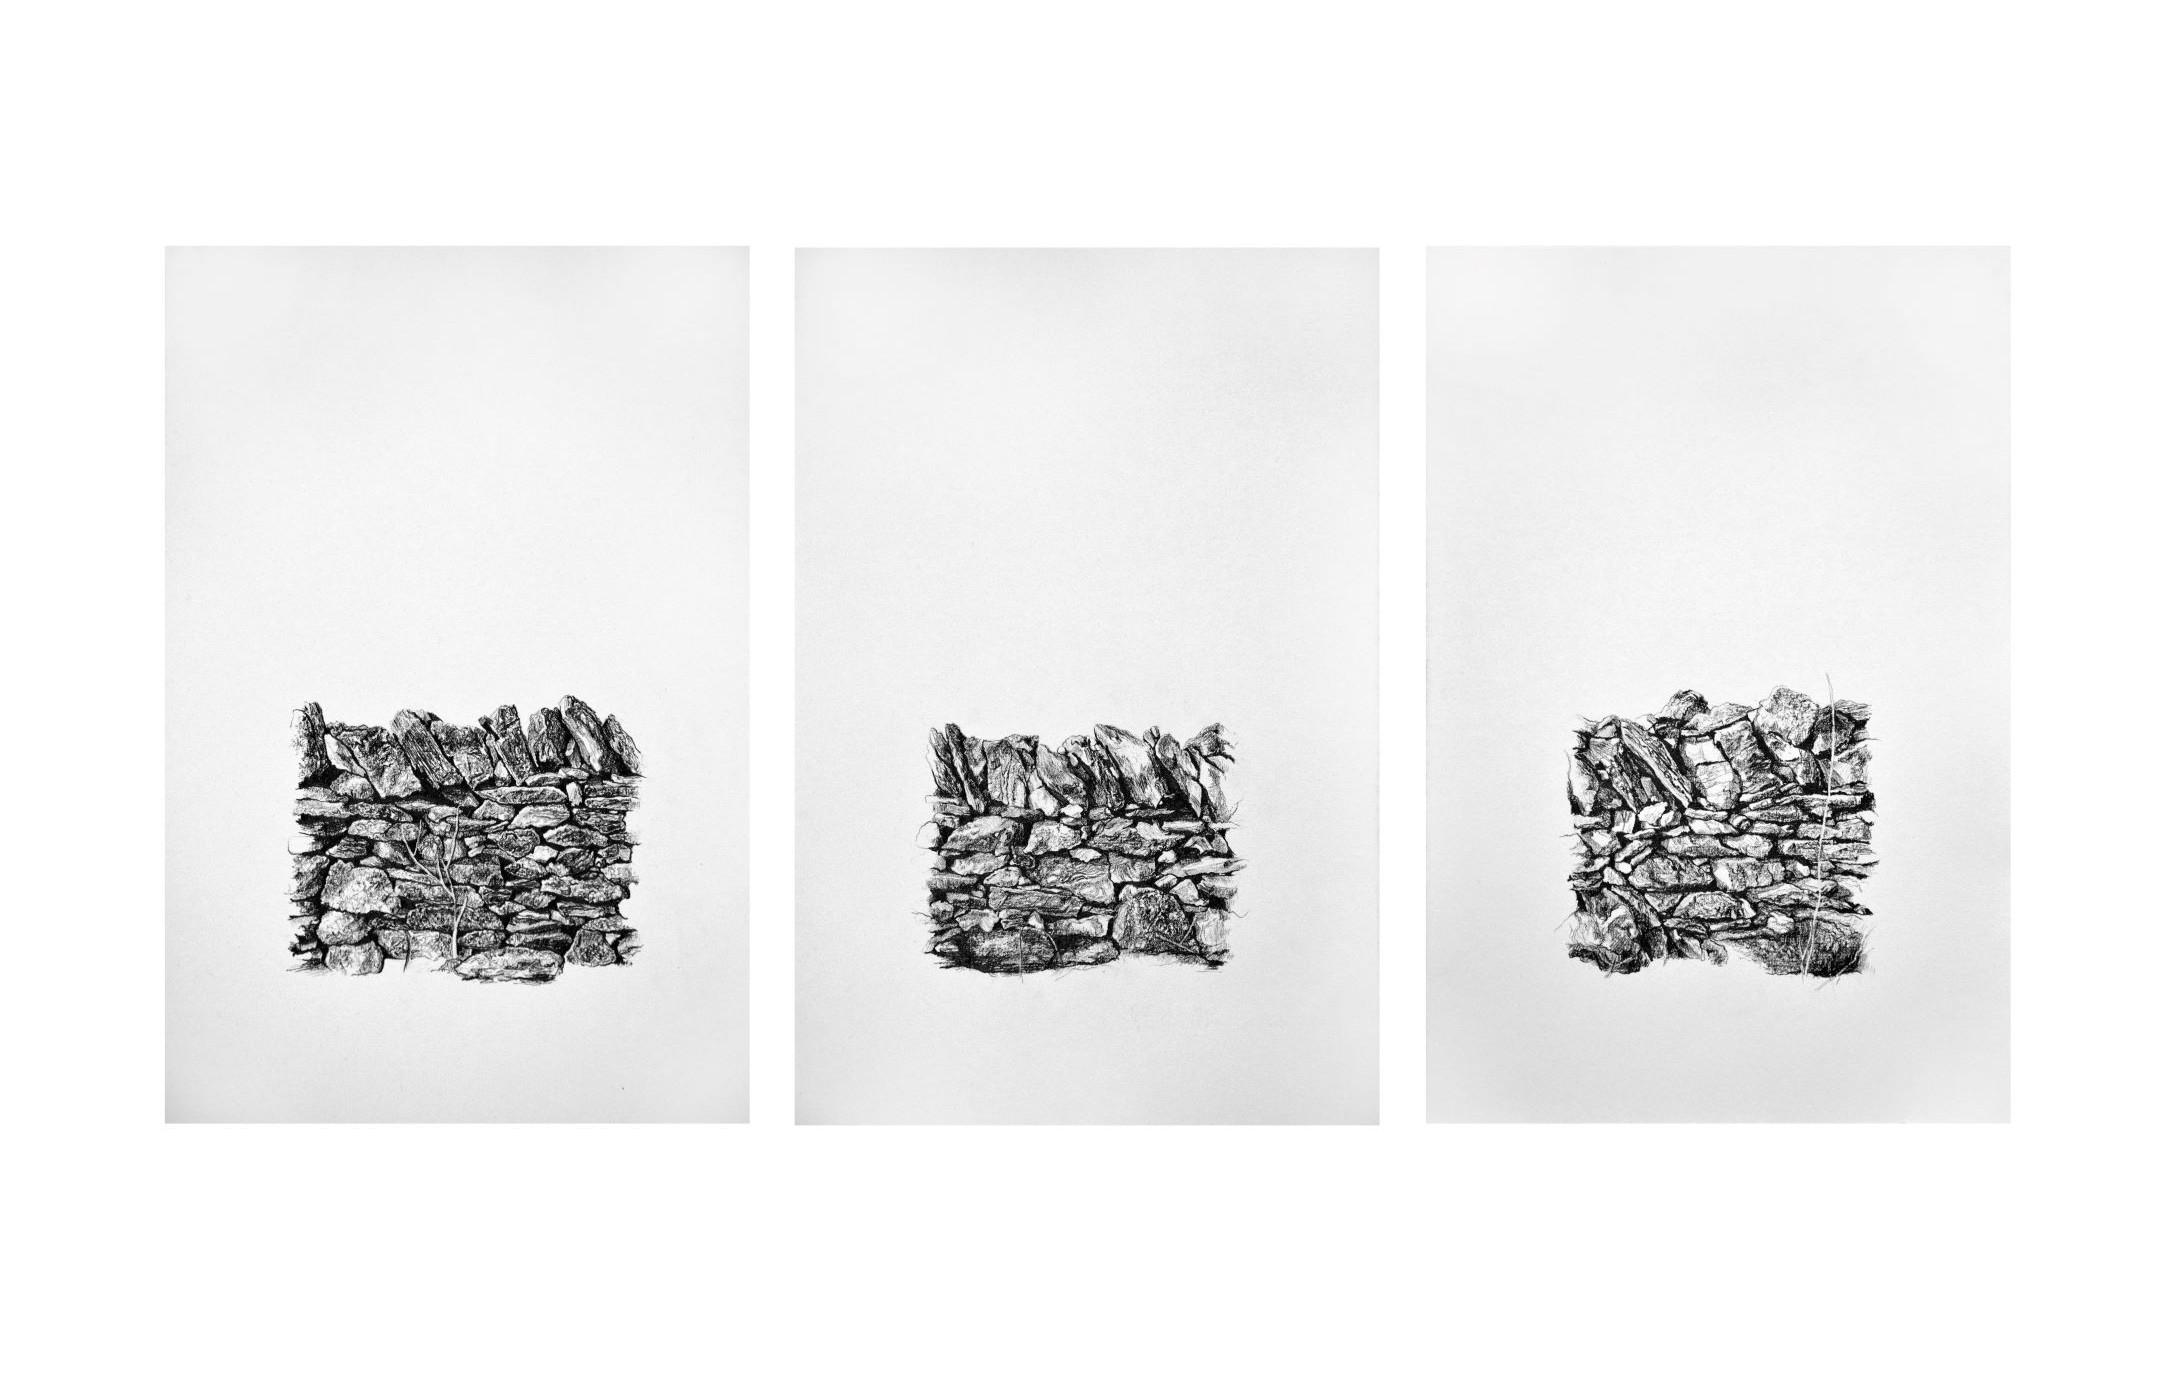 Xerolithia Triptych, drawings. Graphite on Arches Paper, by artist Neva Bergemann